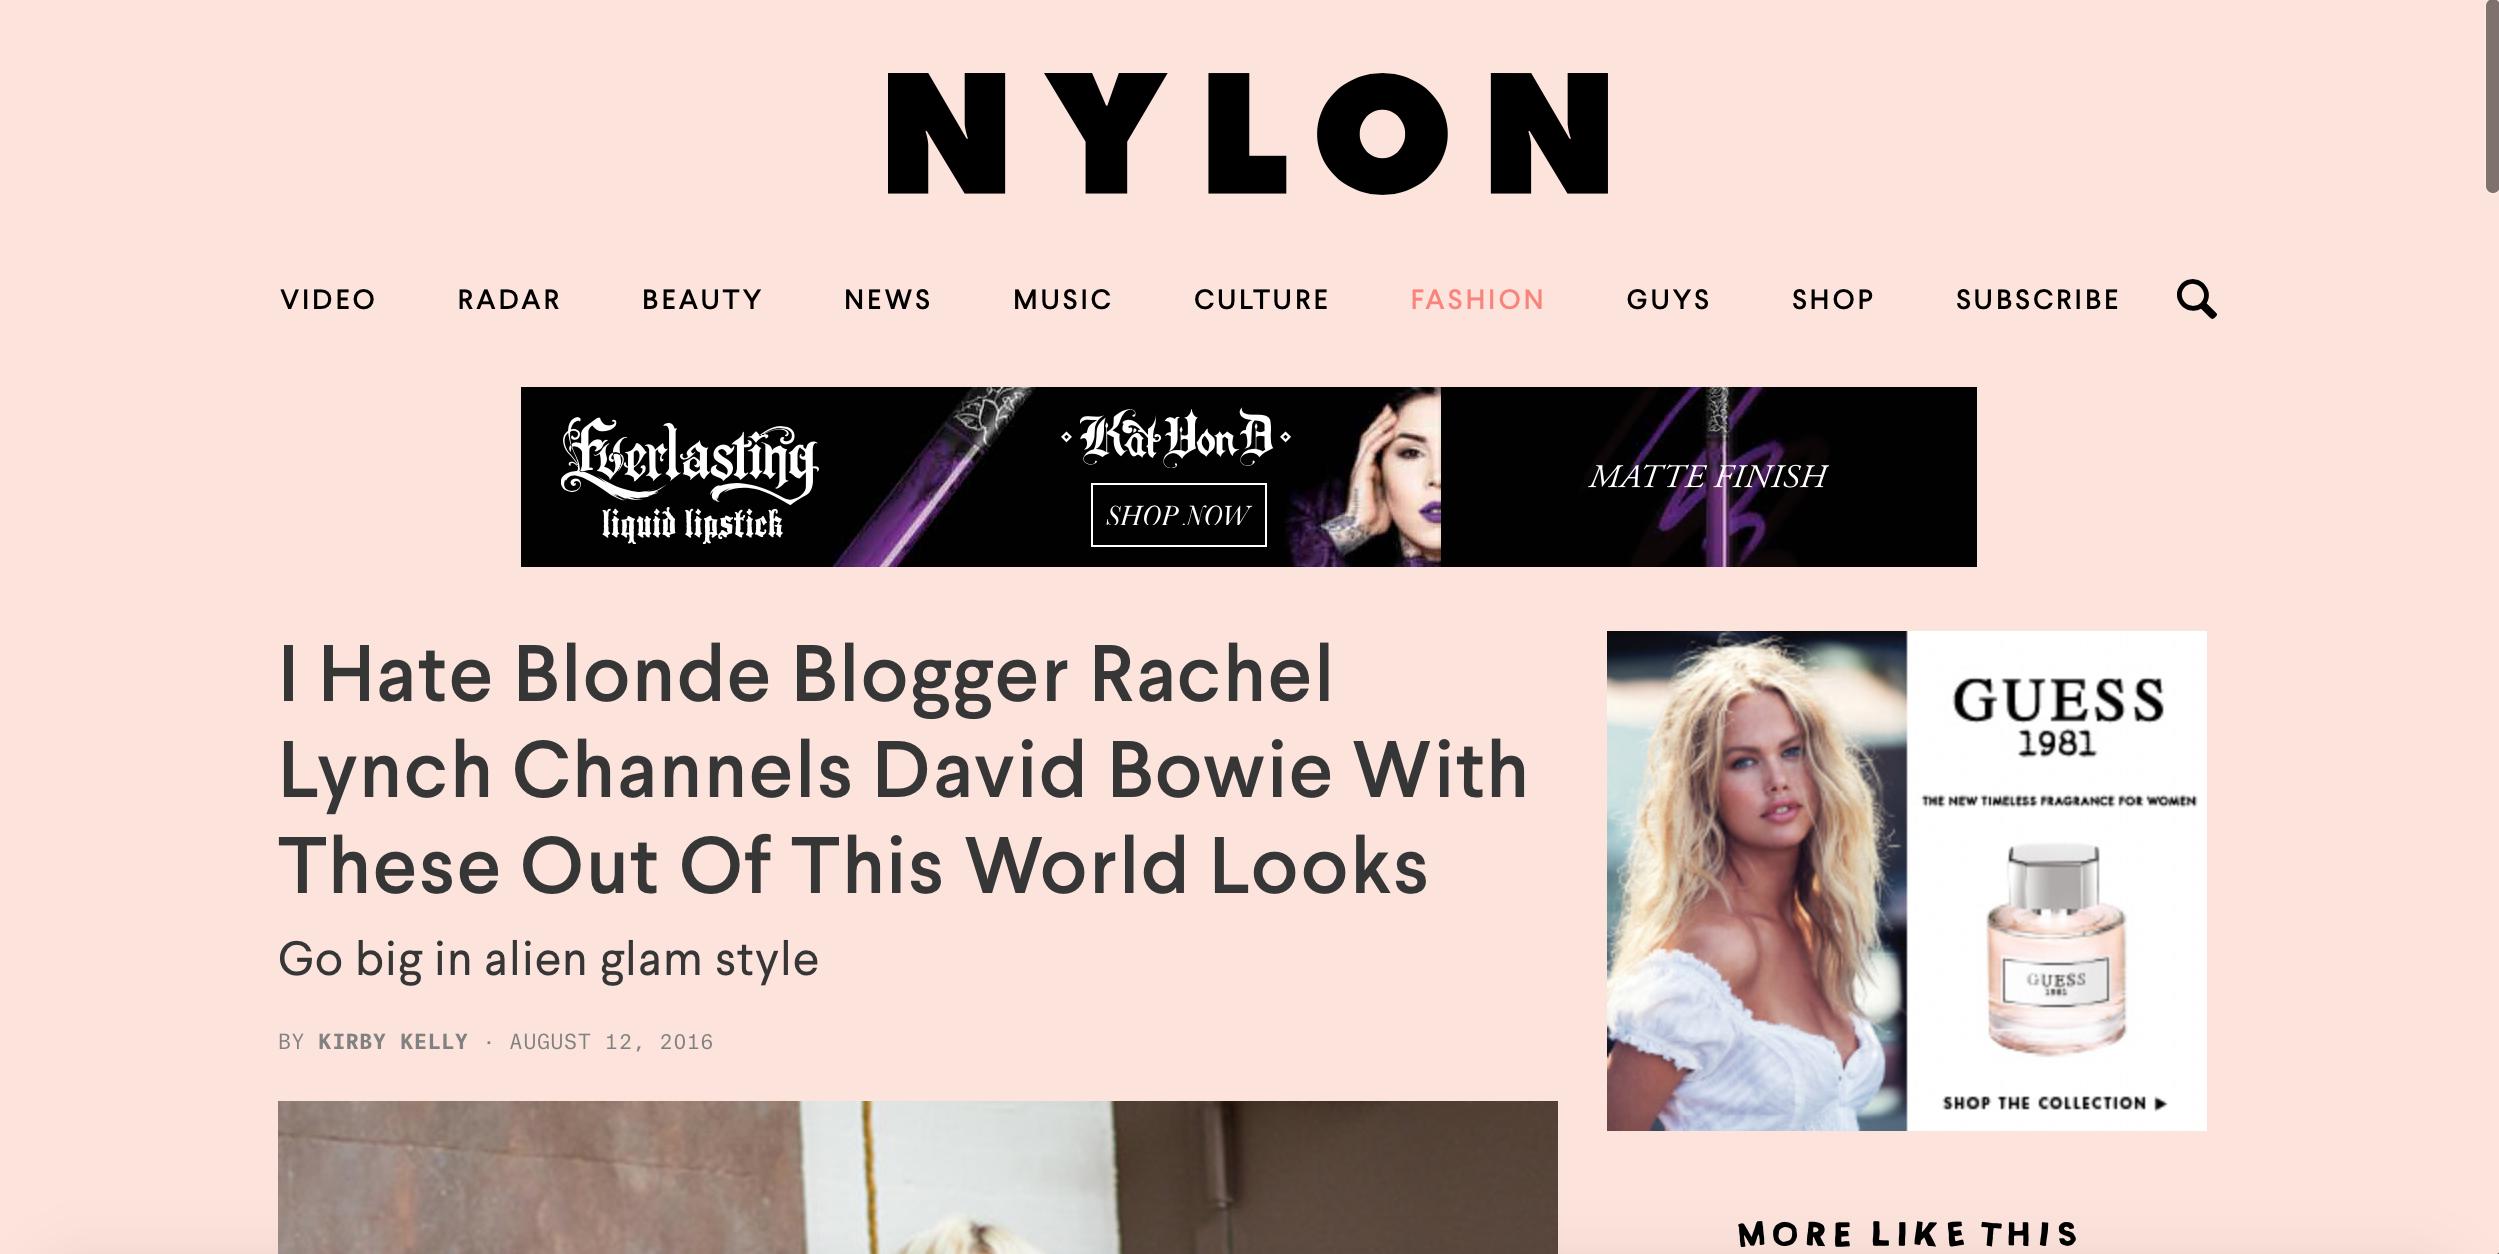 NYLON -http://www.nylon.com/articles/rachel-lynch-vintage-looks-nylonshop